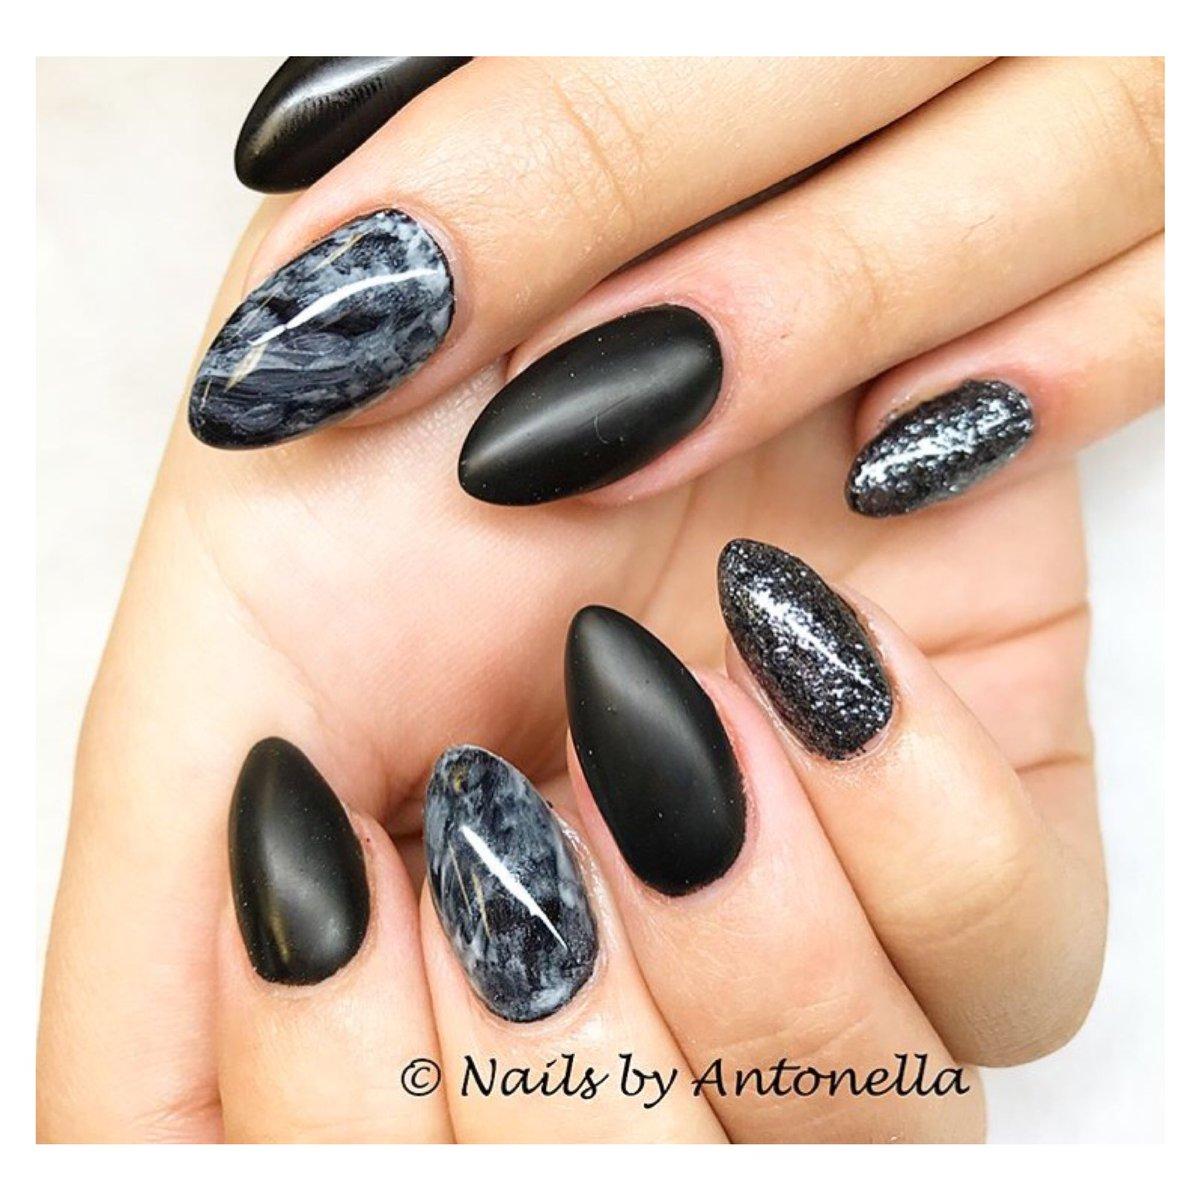 Pillarssalon On Twitter Nails By Antonella Gelnails Envoguenails Envogue Black Grey Marble Glitter Sparkle Burnaby Theheights Yvrnails Yvr Https T Co Kteuxpp8ly